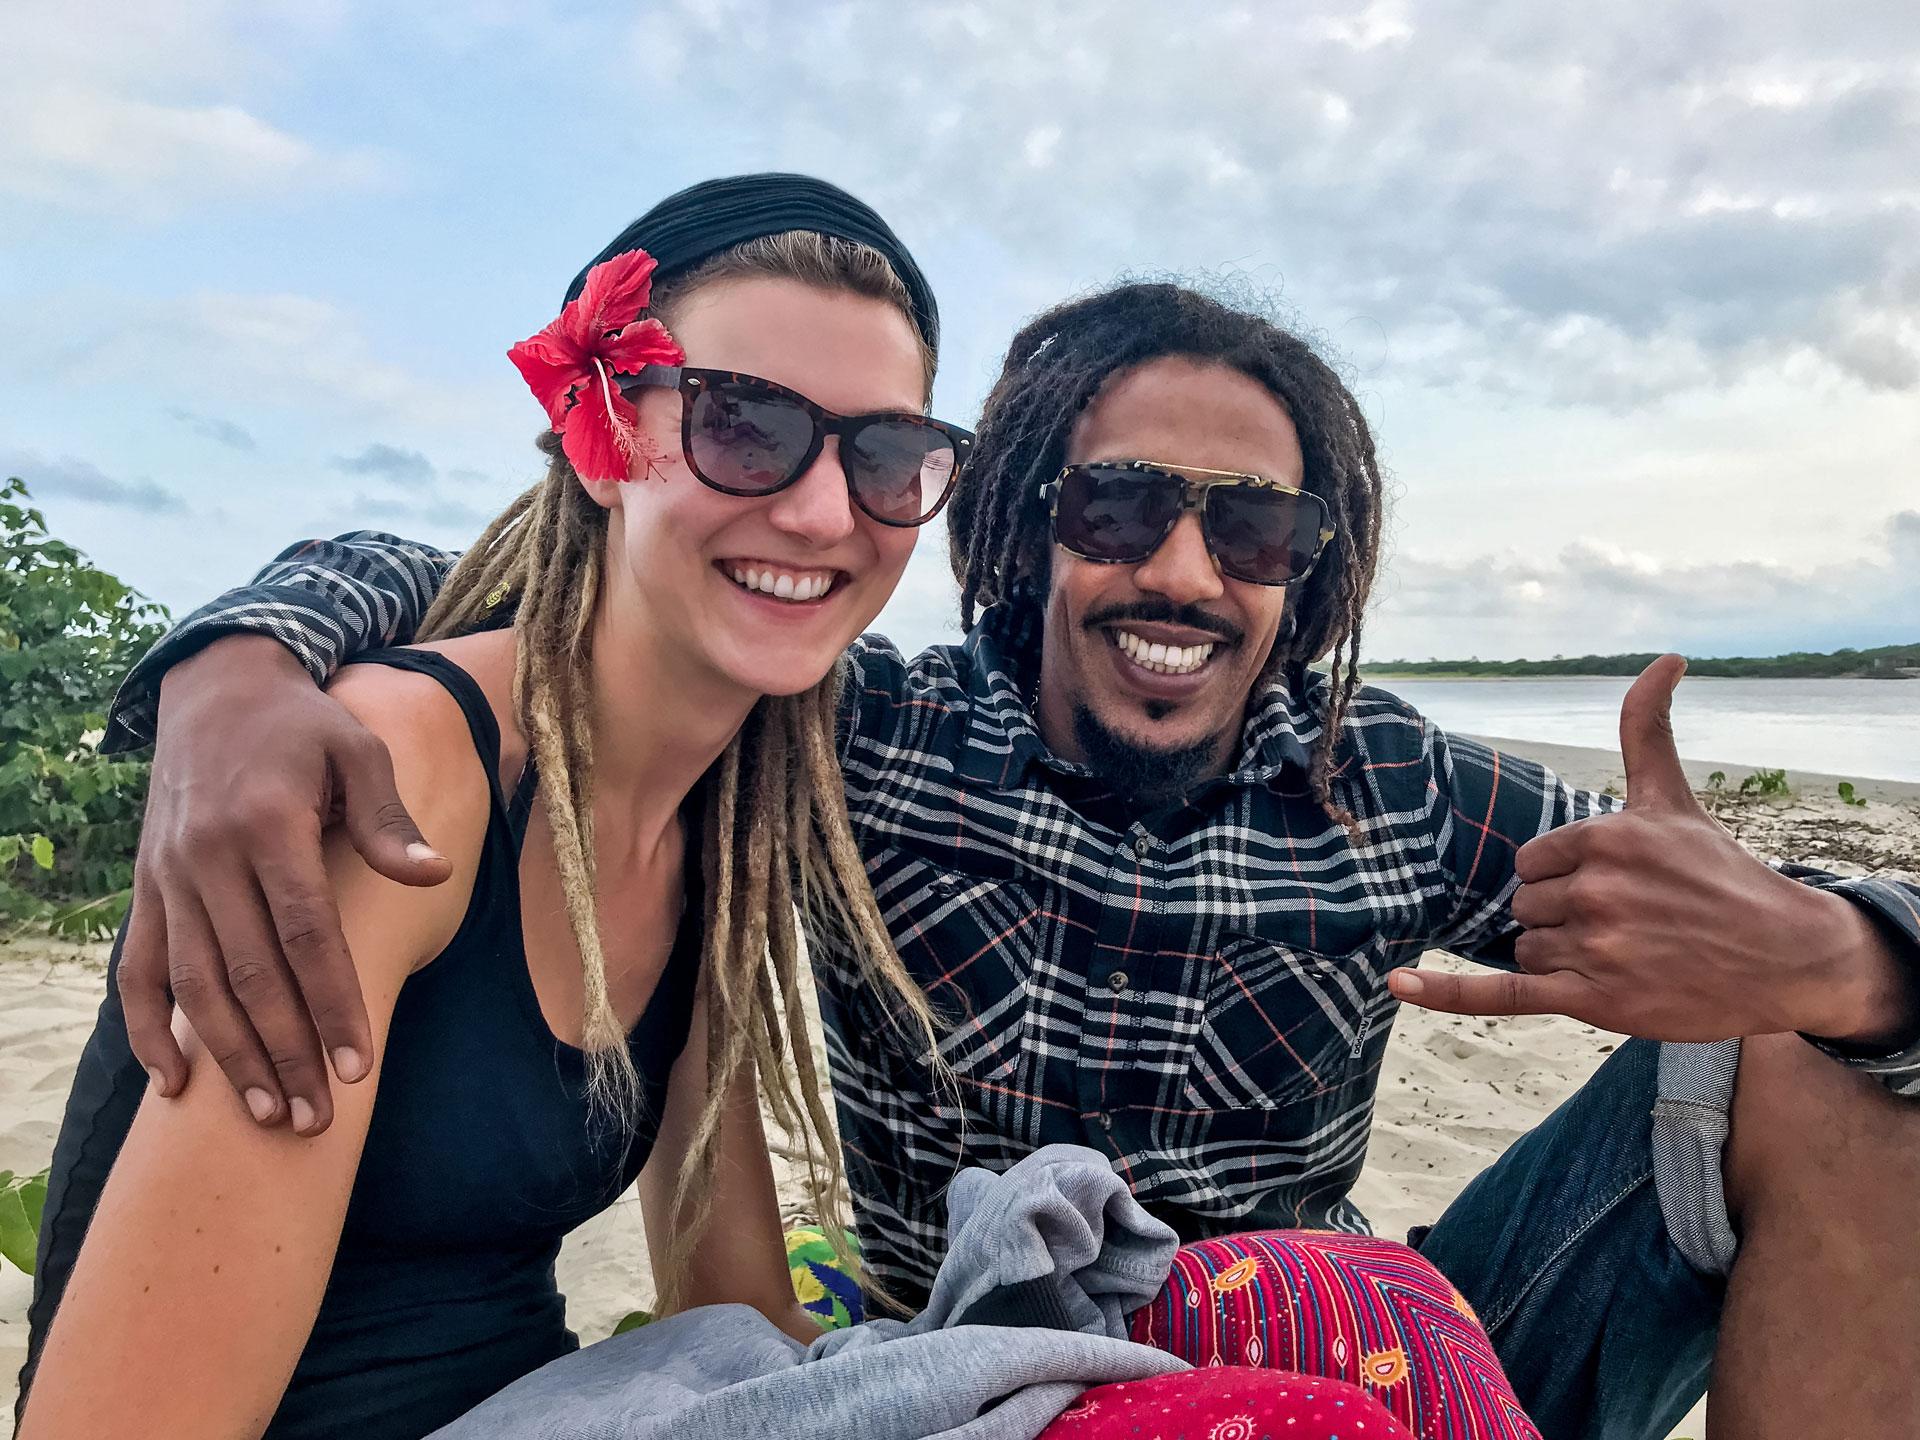 Dreadlock couple at beach in Barra do Una, Brazil